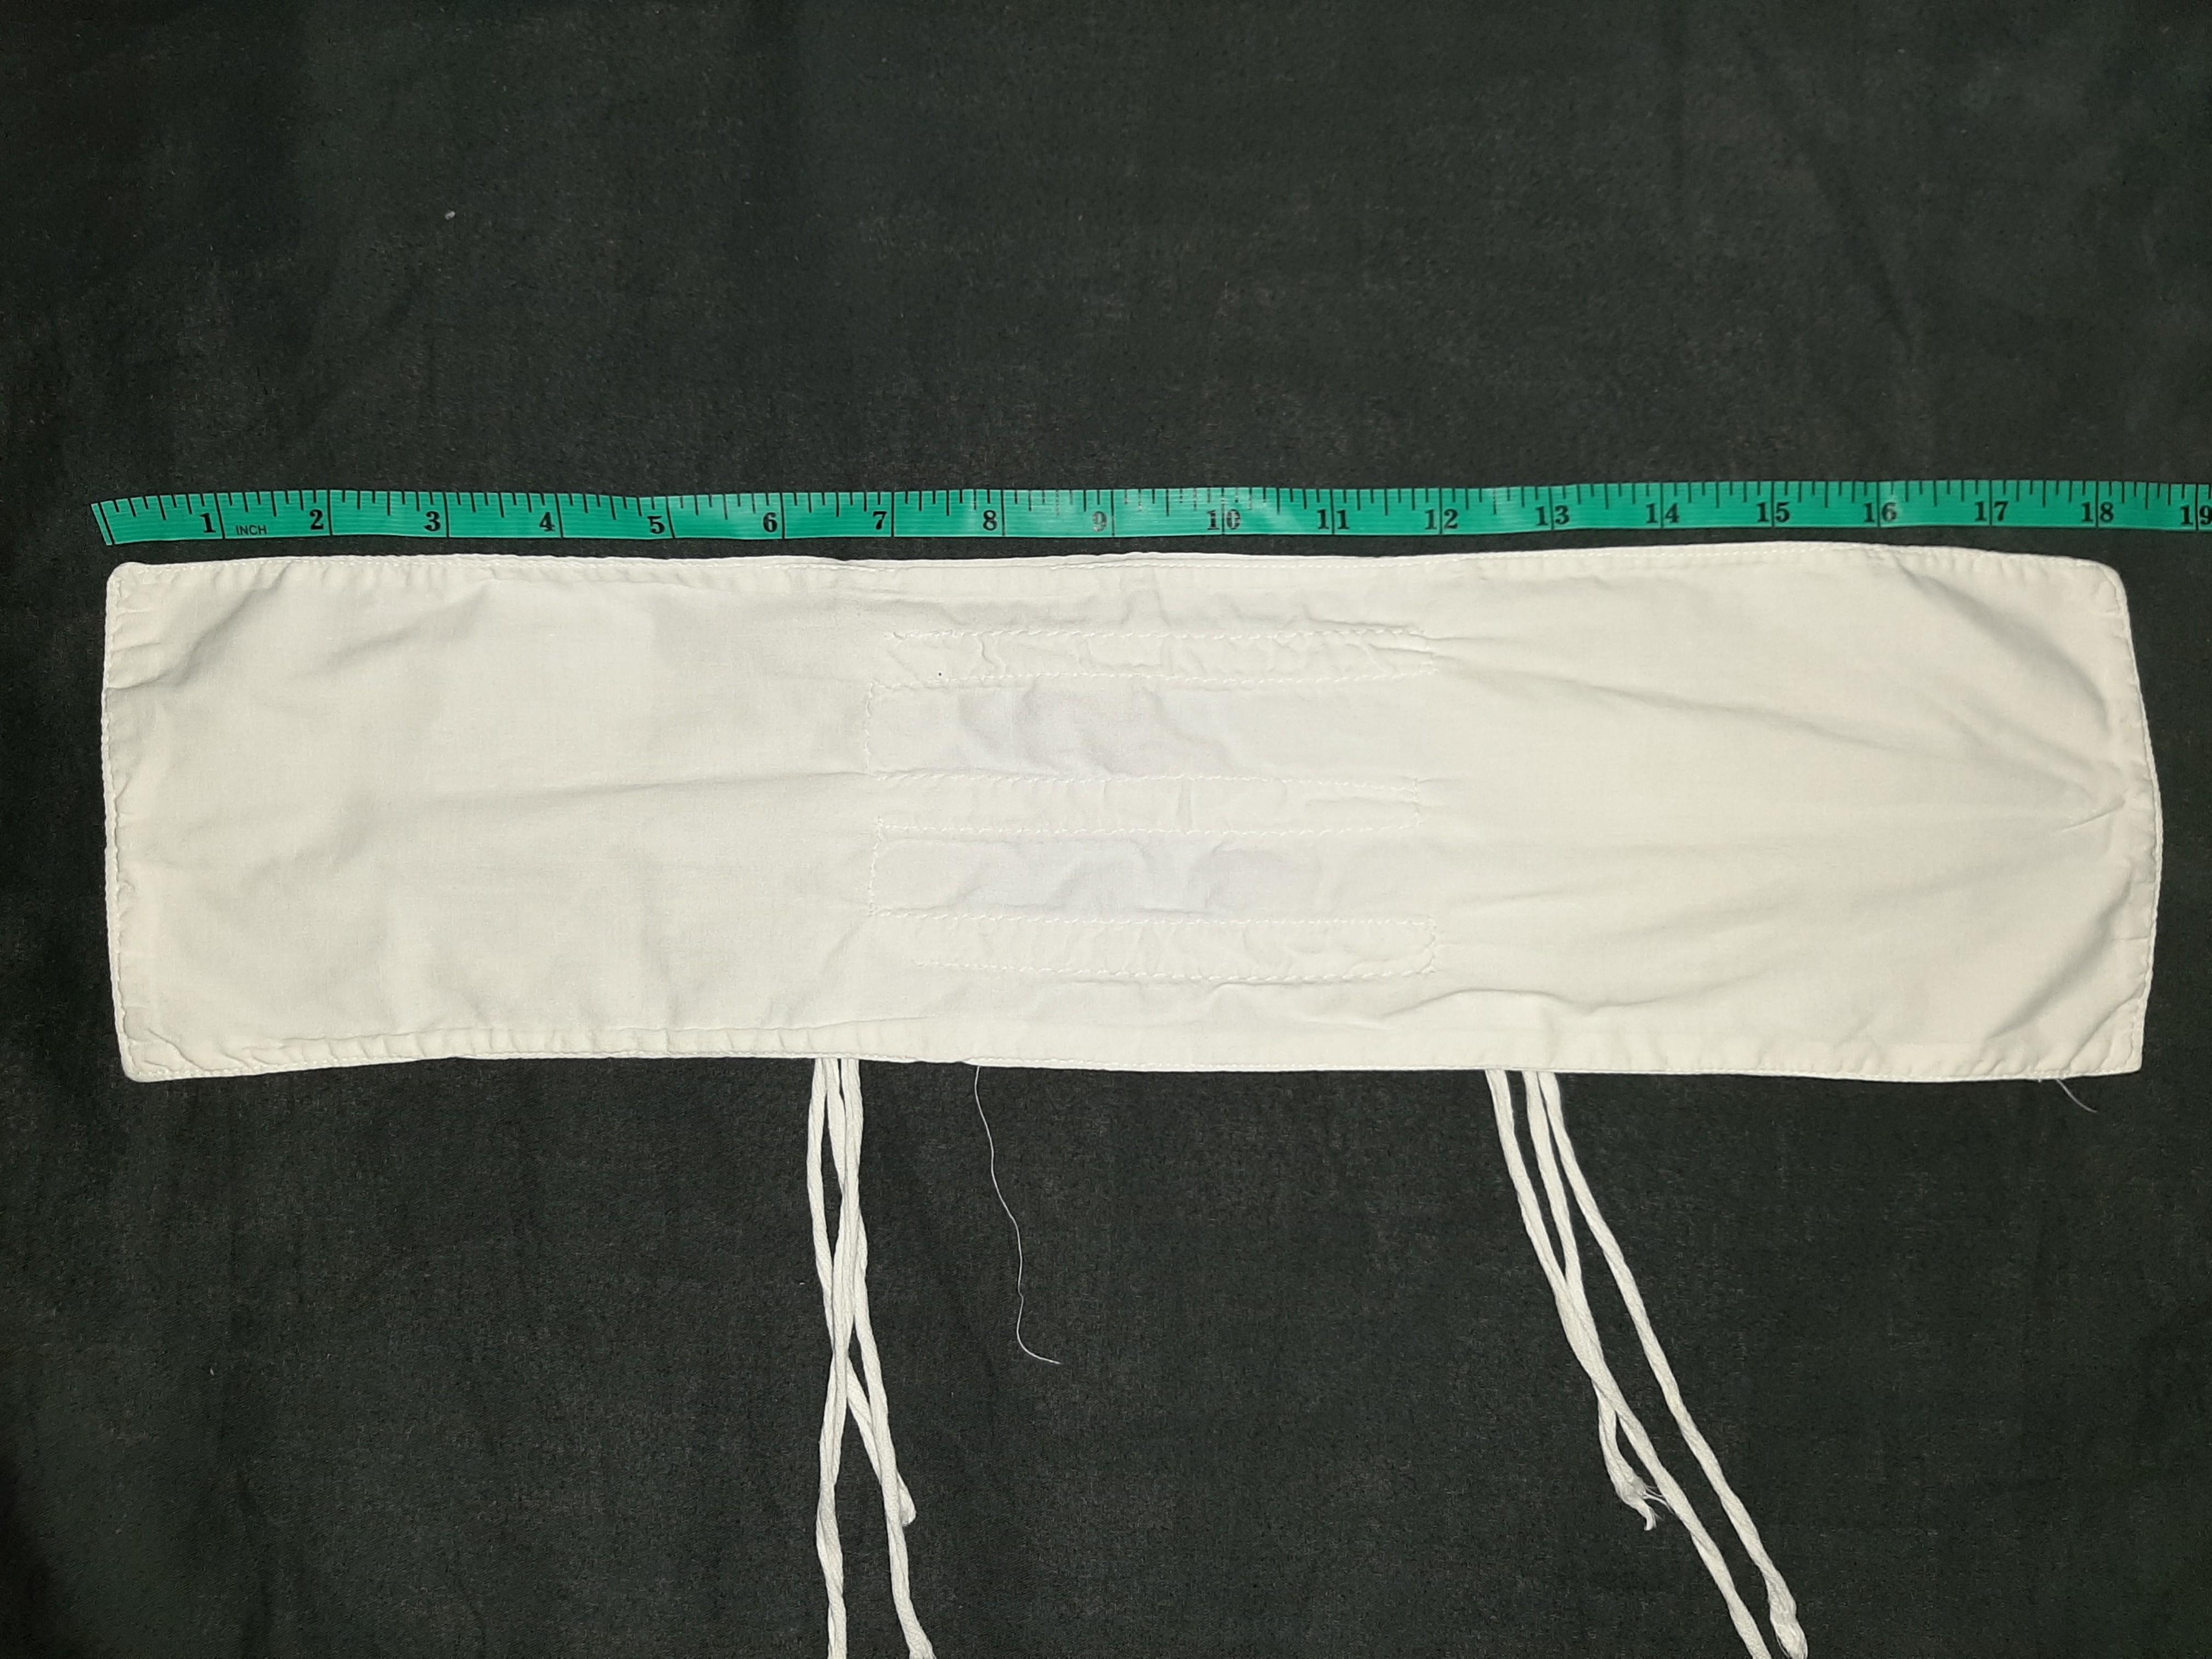 Baby tradisional barut/belly binder